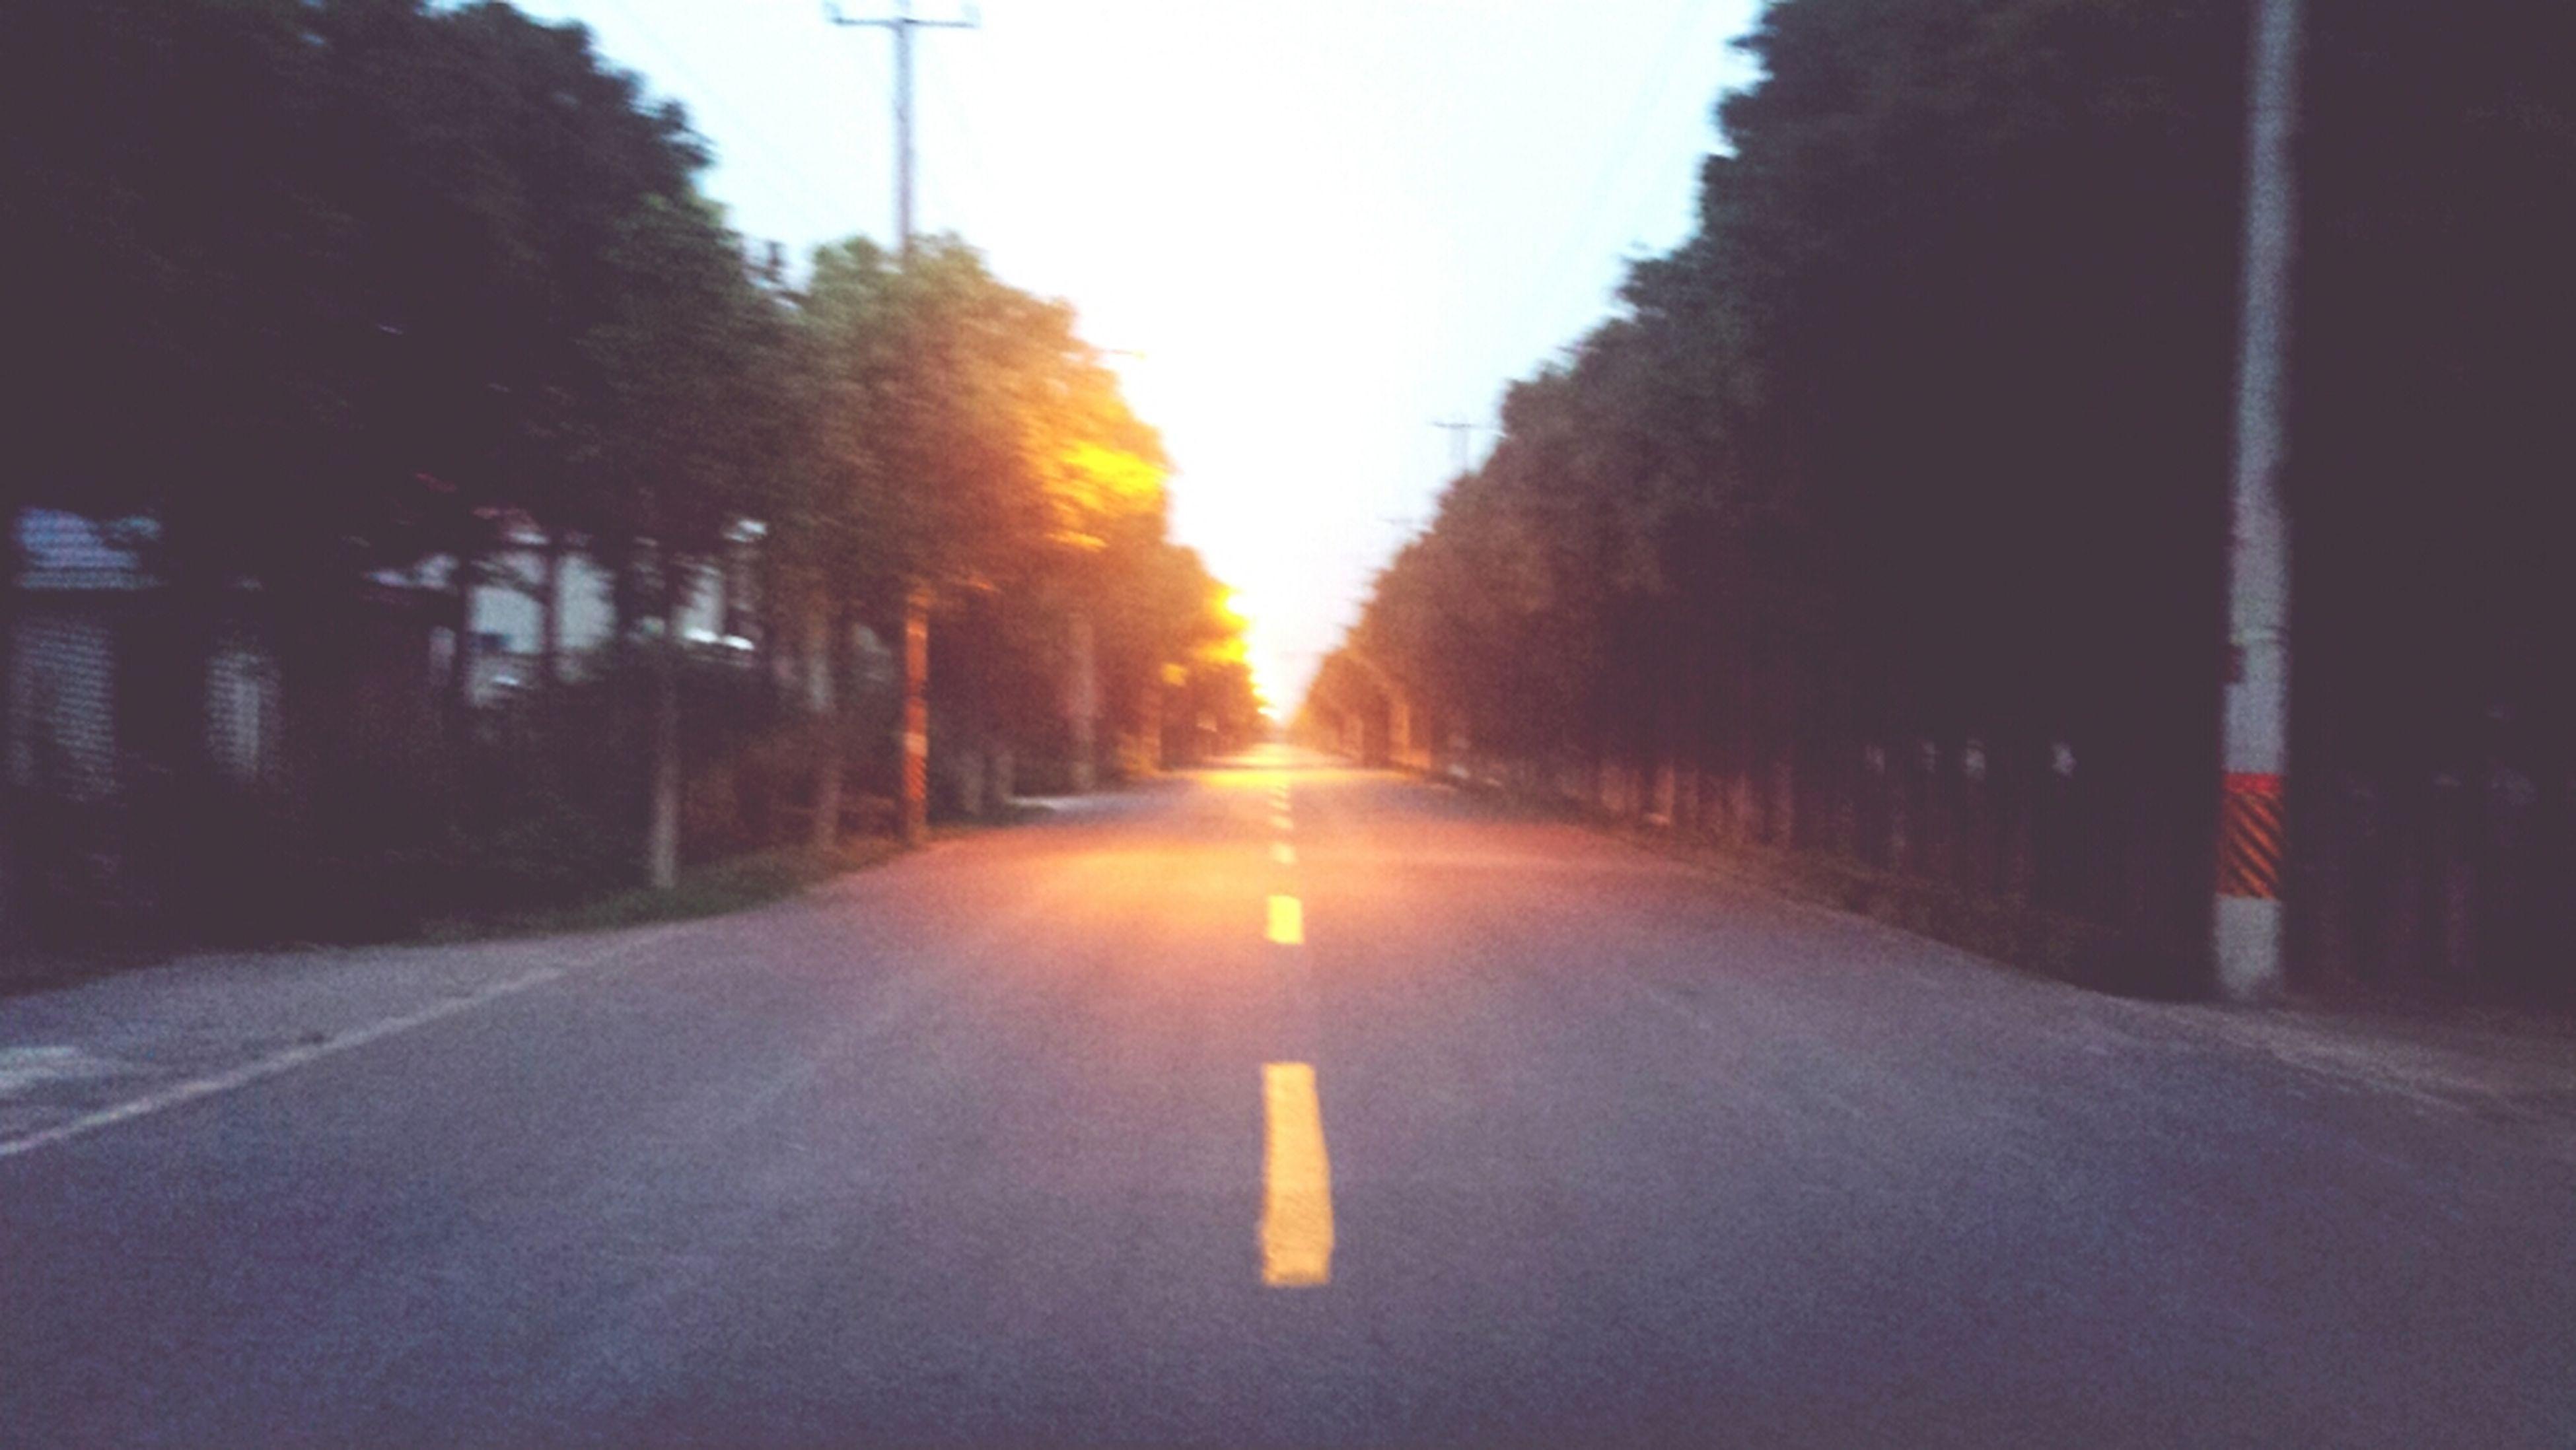 the way forward, transportation, diminishing perspective, road, vanishing point, tree, road marking, street, empty, empty road, sunset, asphalt, street light, long, no people, sky, outdoors, road sign, clear sky, sunlight